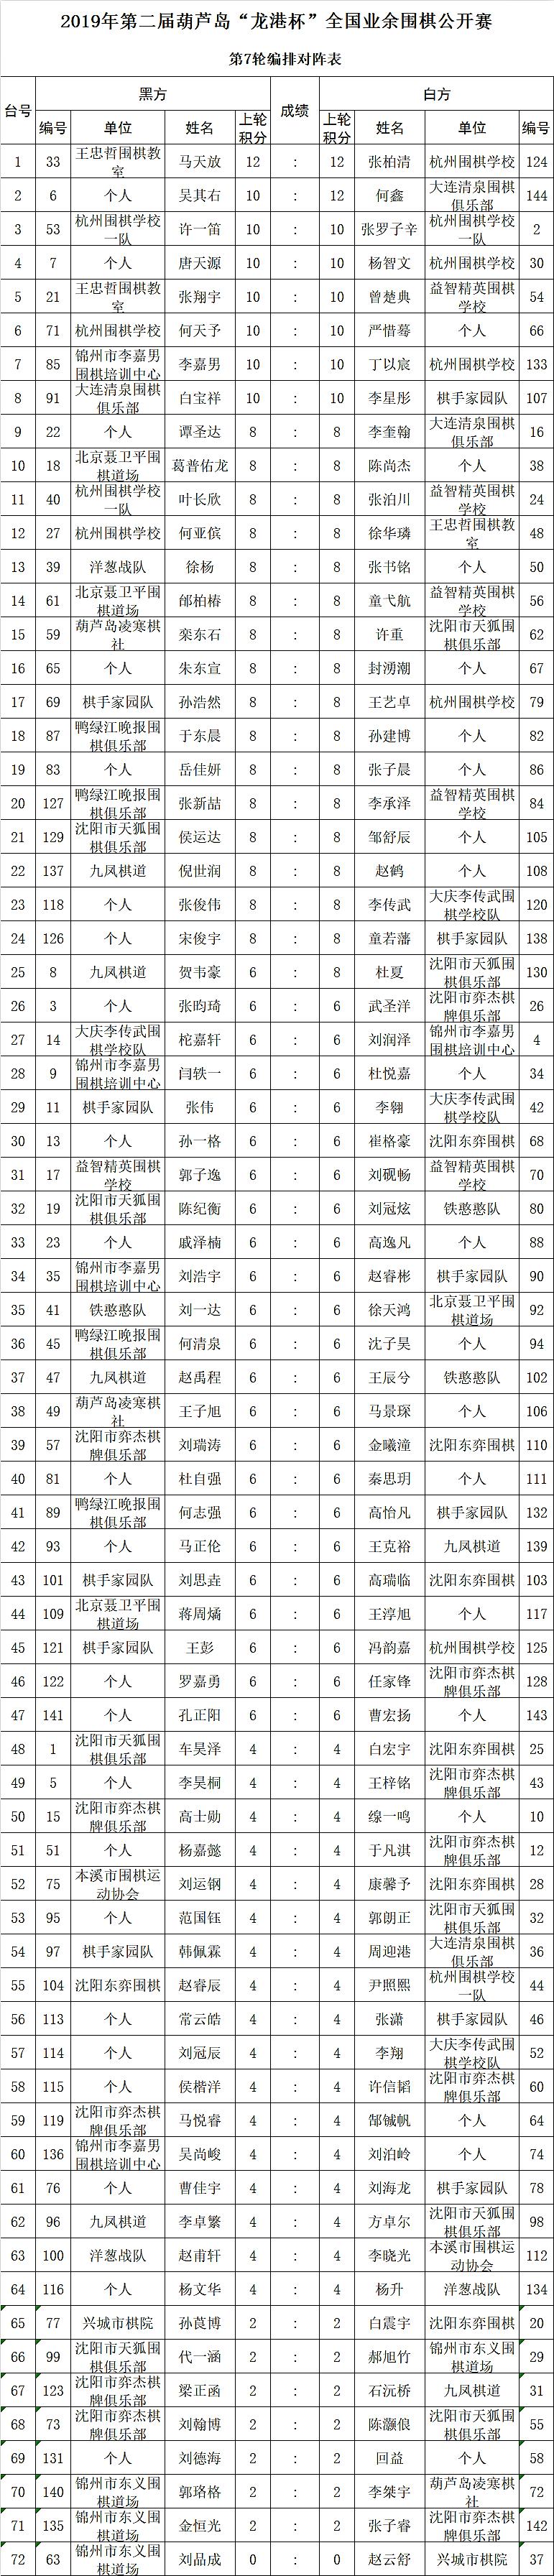 龙港杯第7轮.png